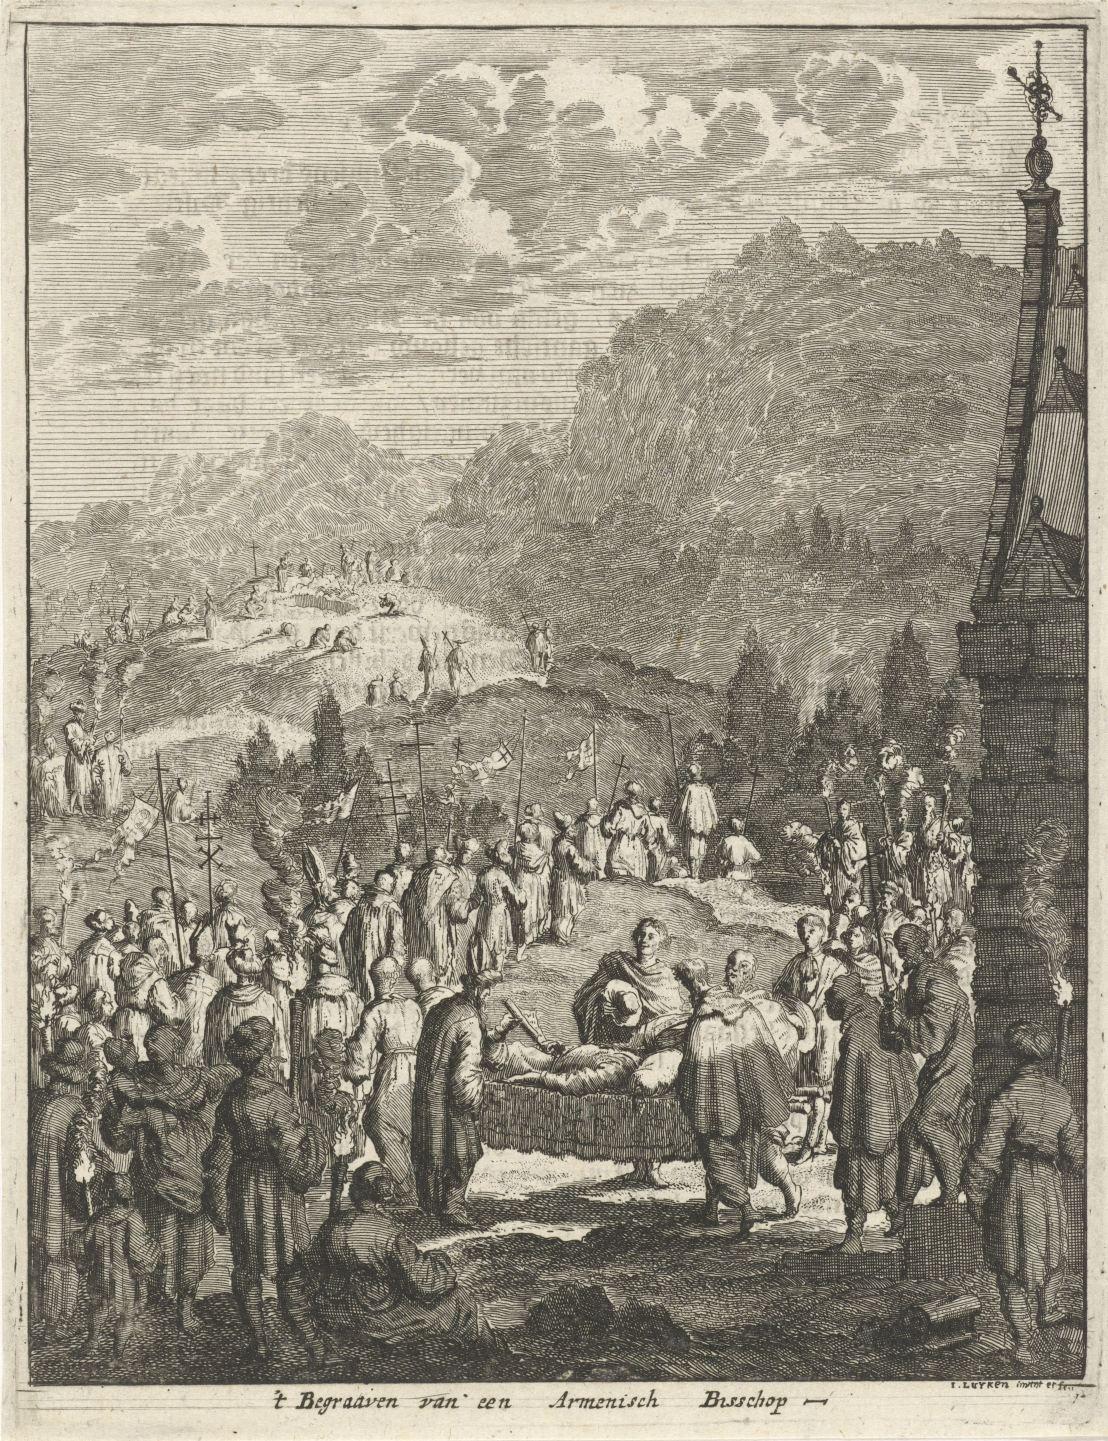 Funeral of an Armenian bishop, Jan Luyken, 1681